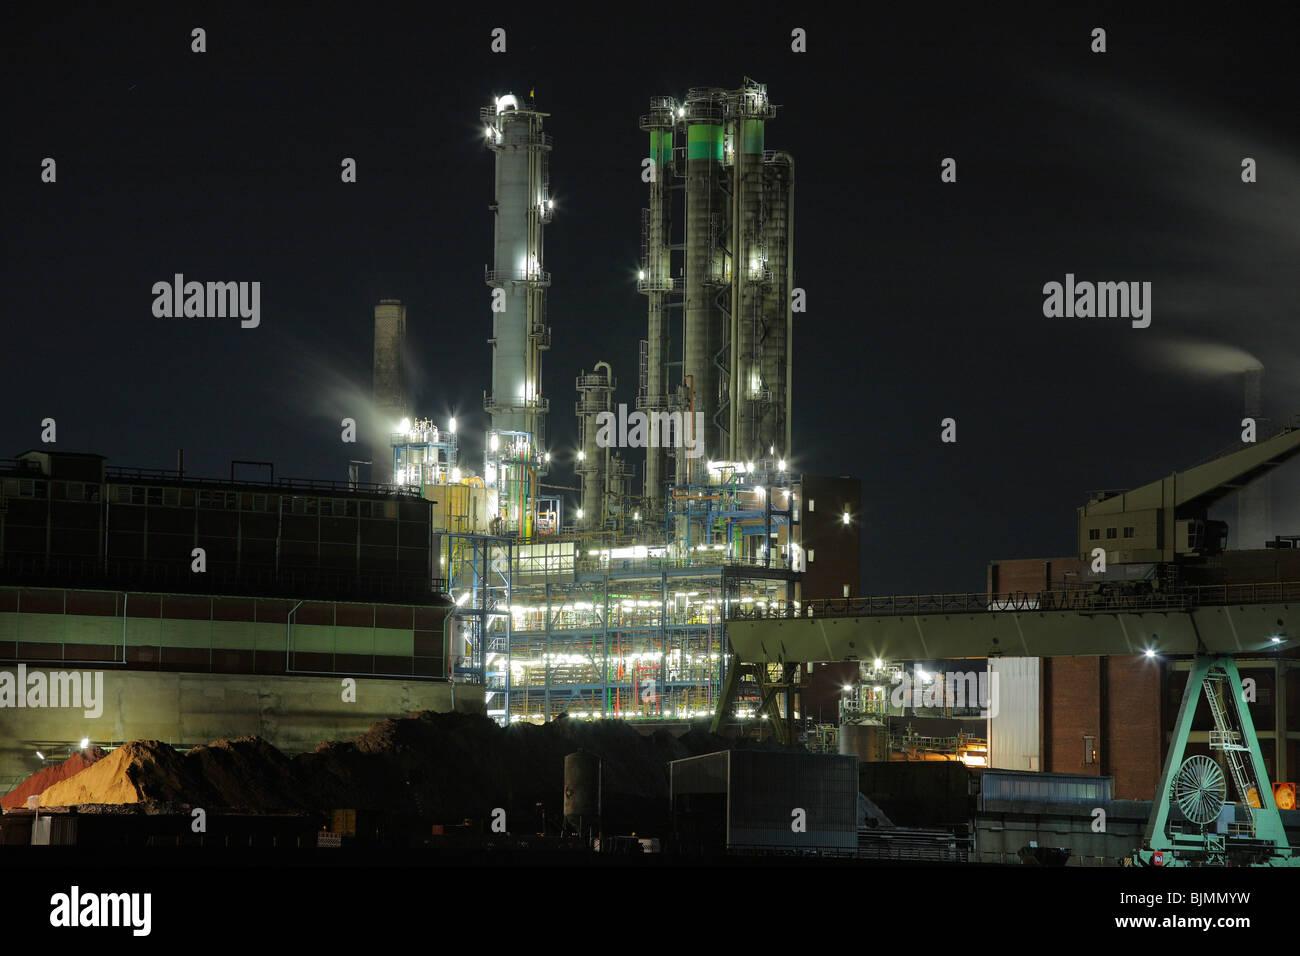 Bayer factory buildings and premises, night shot, Leverkusen, North Rhine-Westphalia, Germany, Europe - Stock Image